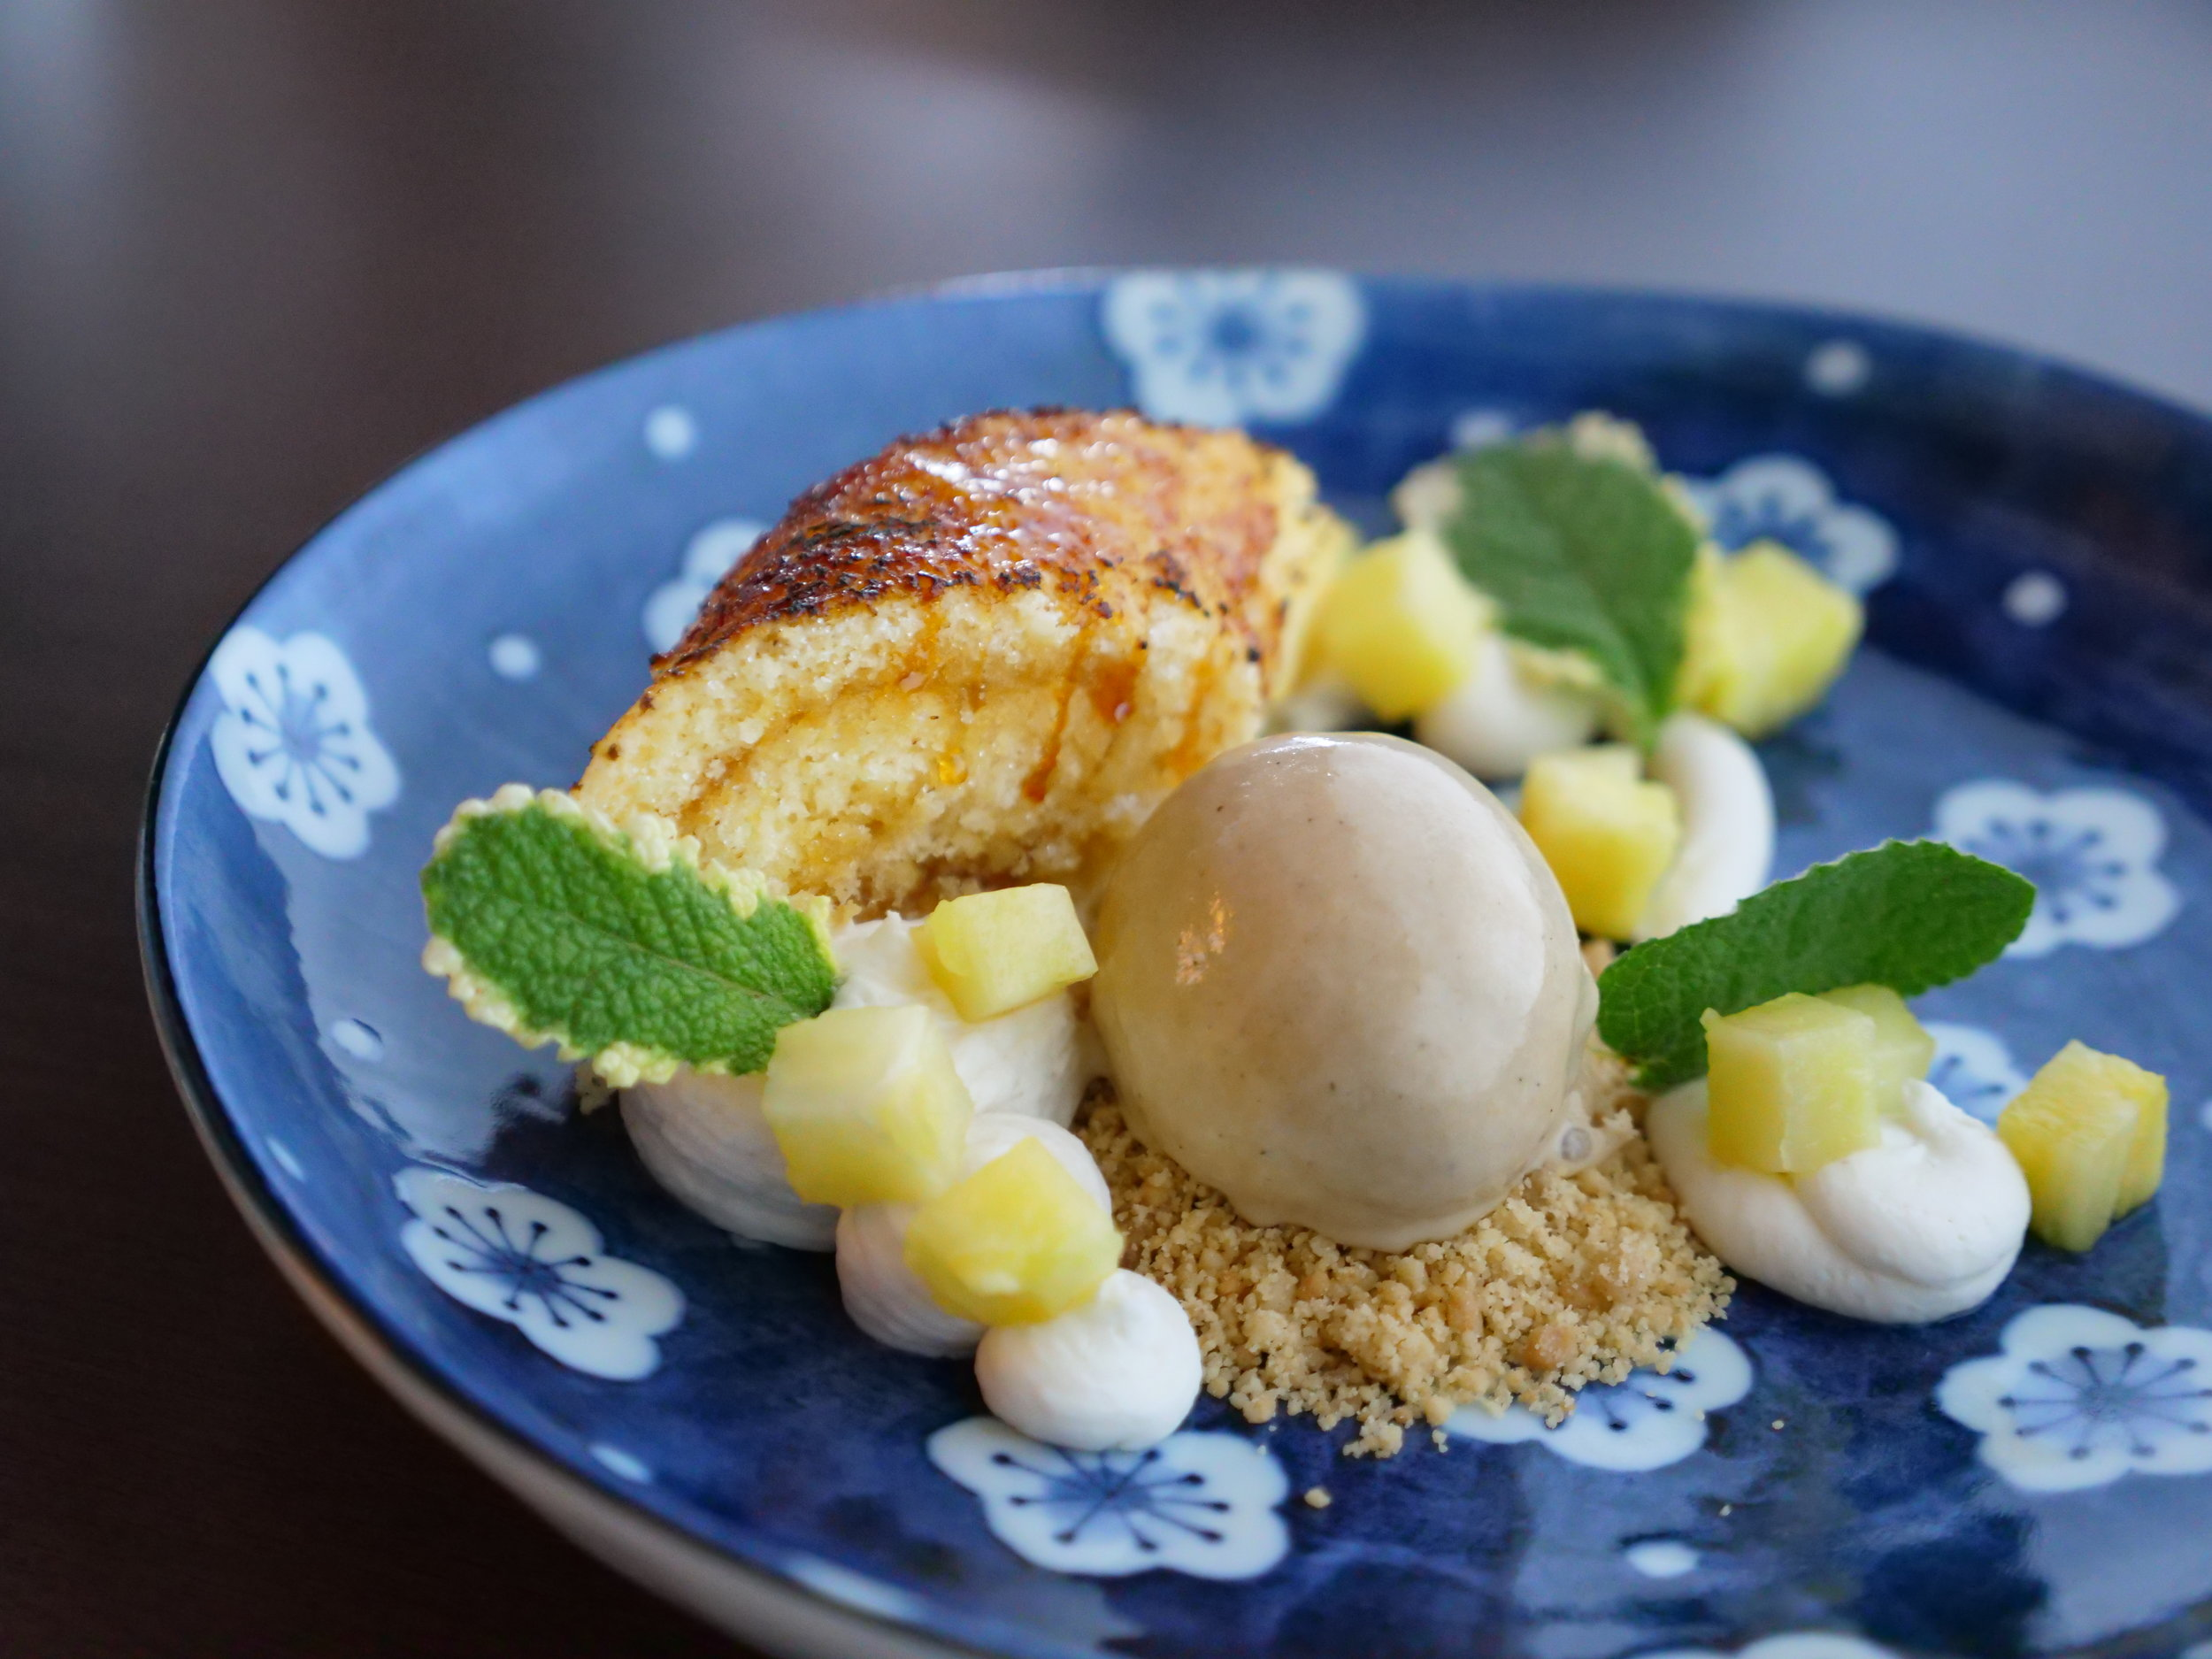 PINEAPPLE CAKE, COCONUT CREAM, CINNAMON CRUMB, OOLONG TEA ICE CEAM.